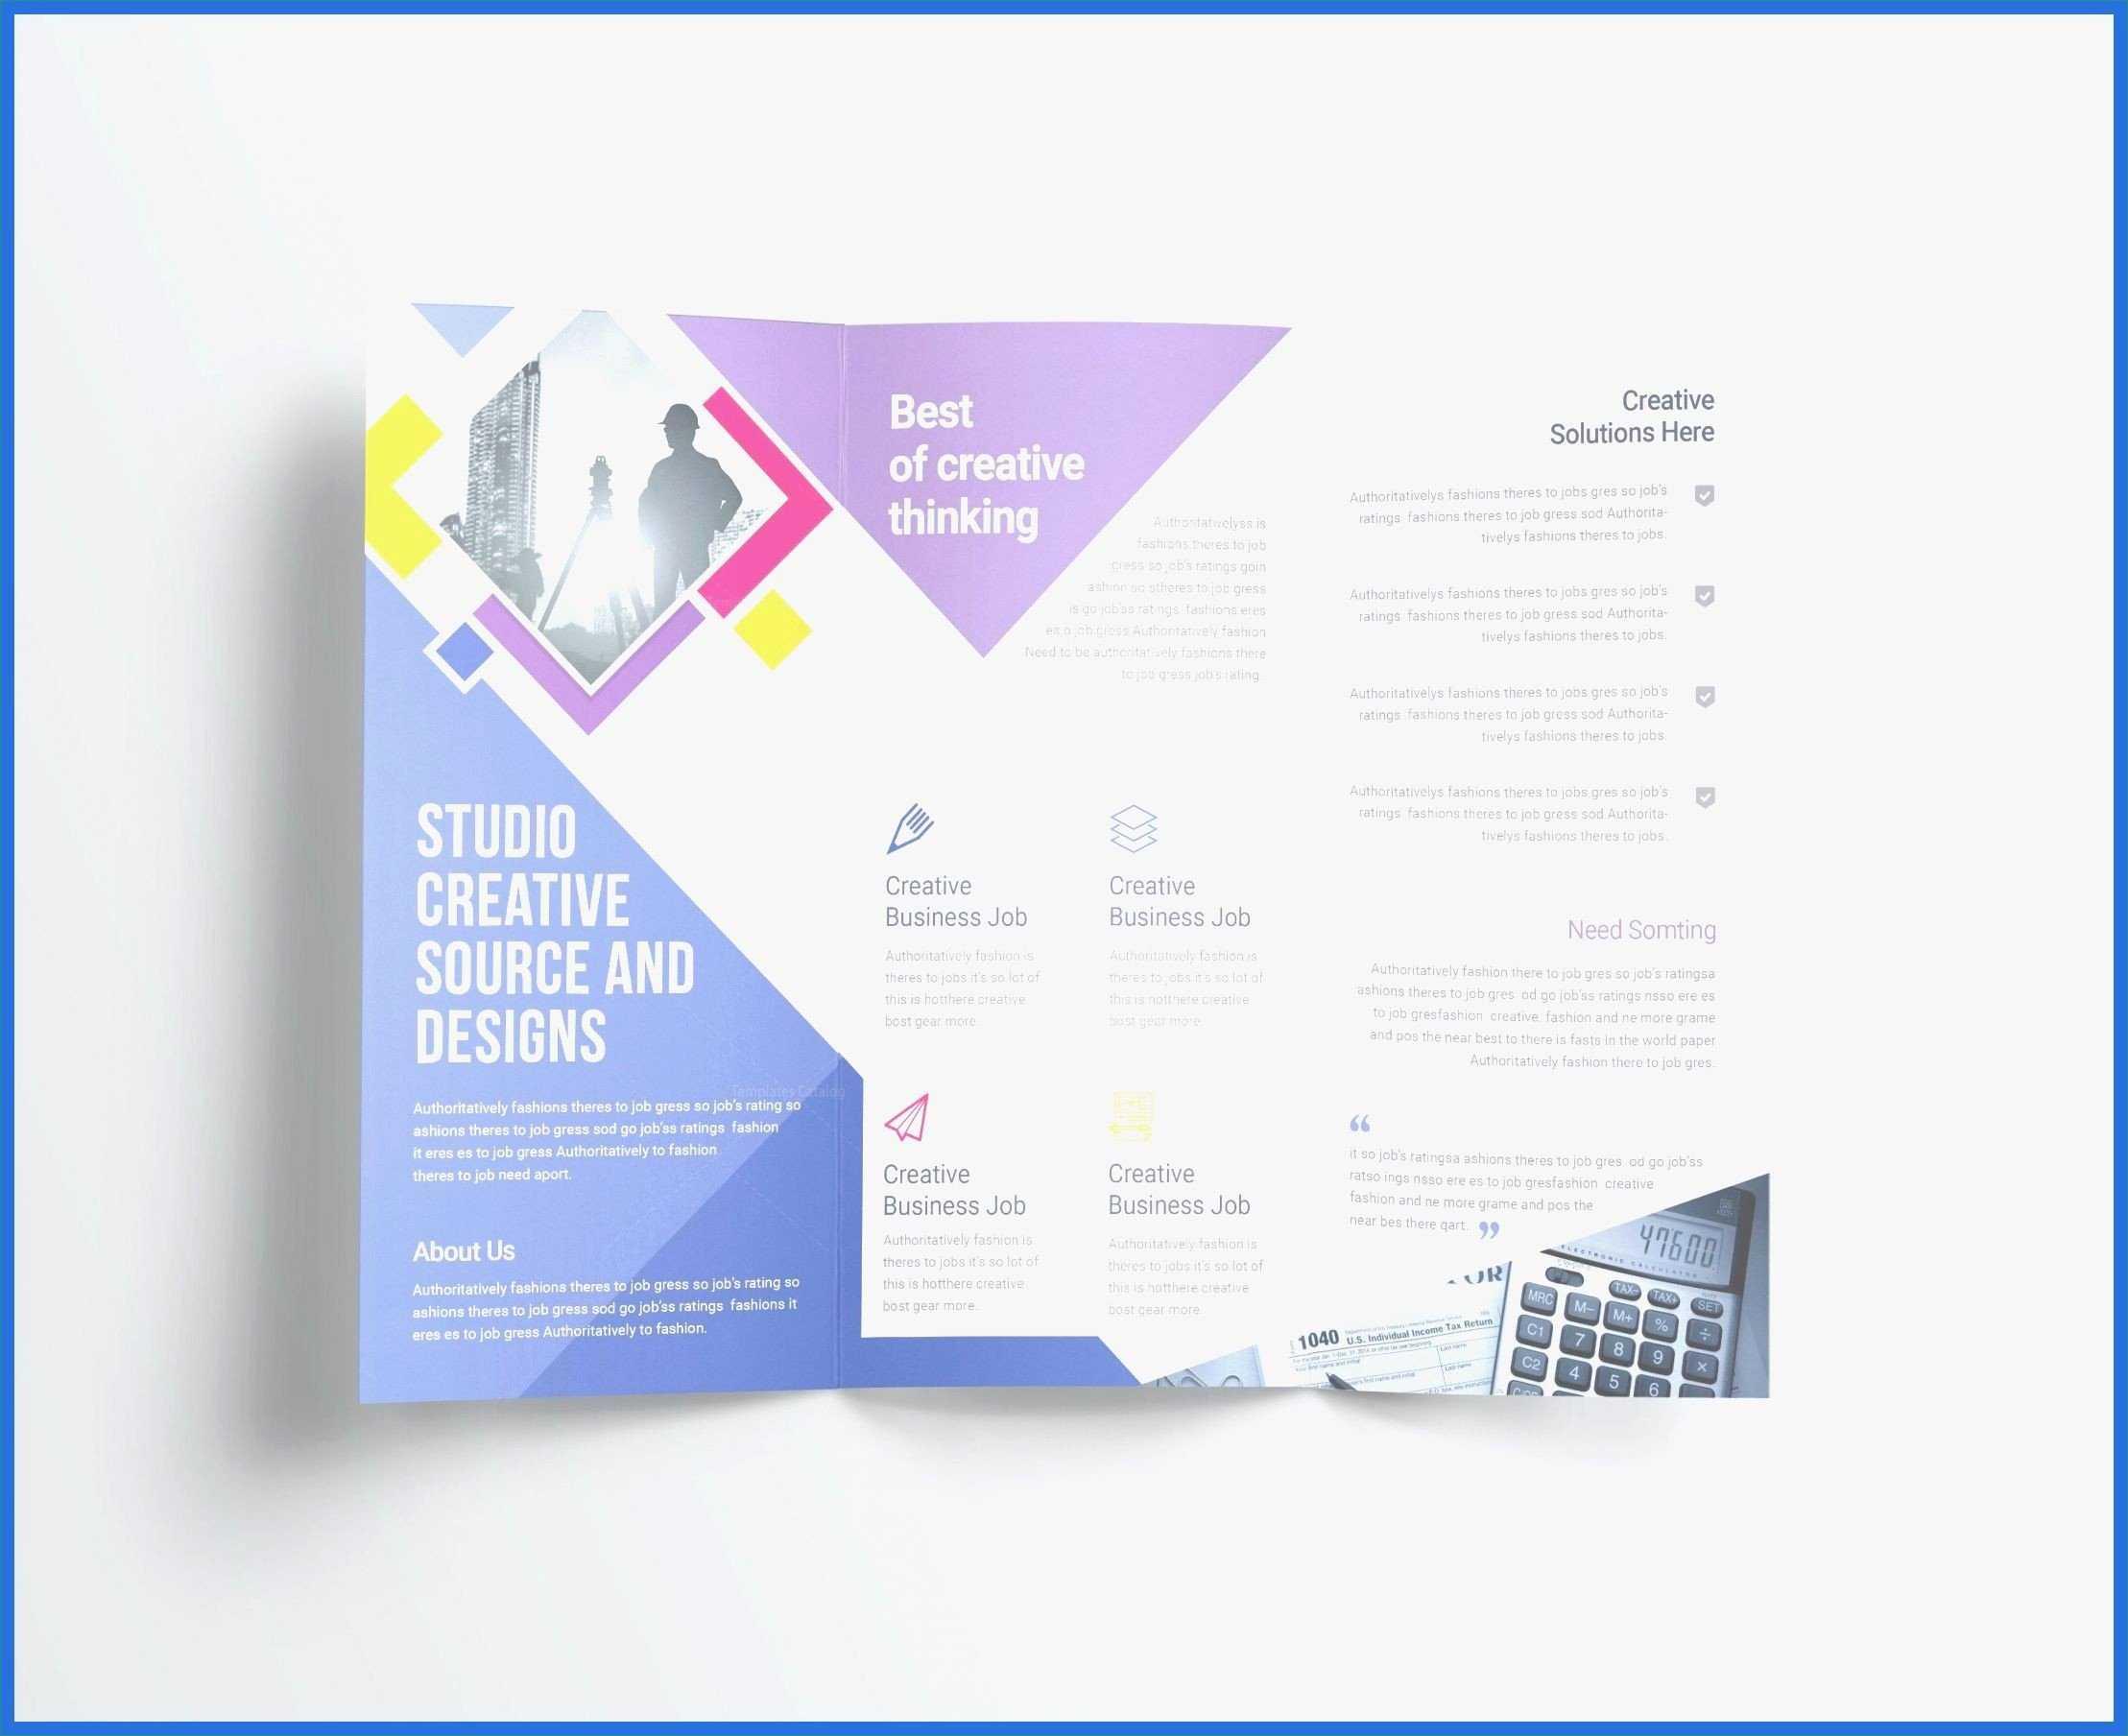 032 Template Ideas Microsoftfice Business Card Free Ms Word intended for Business Card Template Powerpoint Free